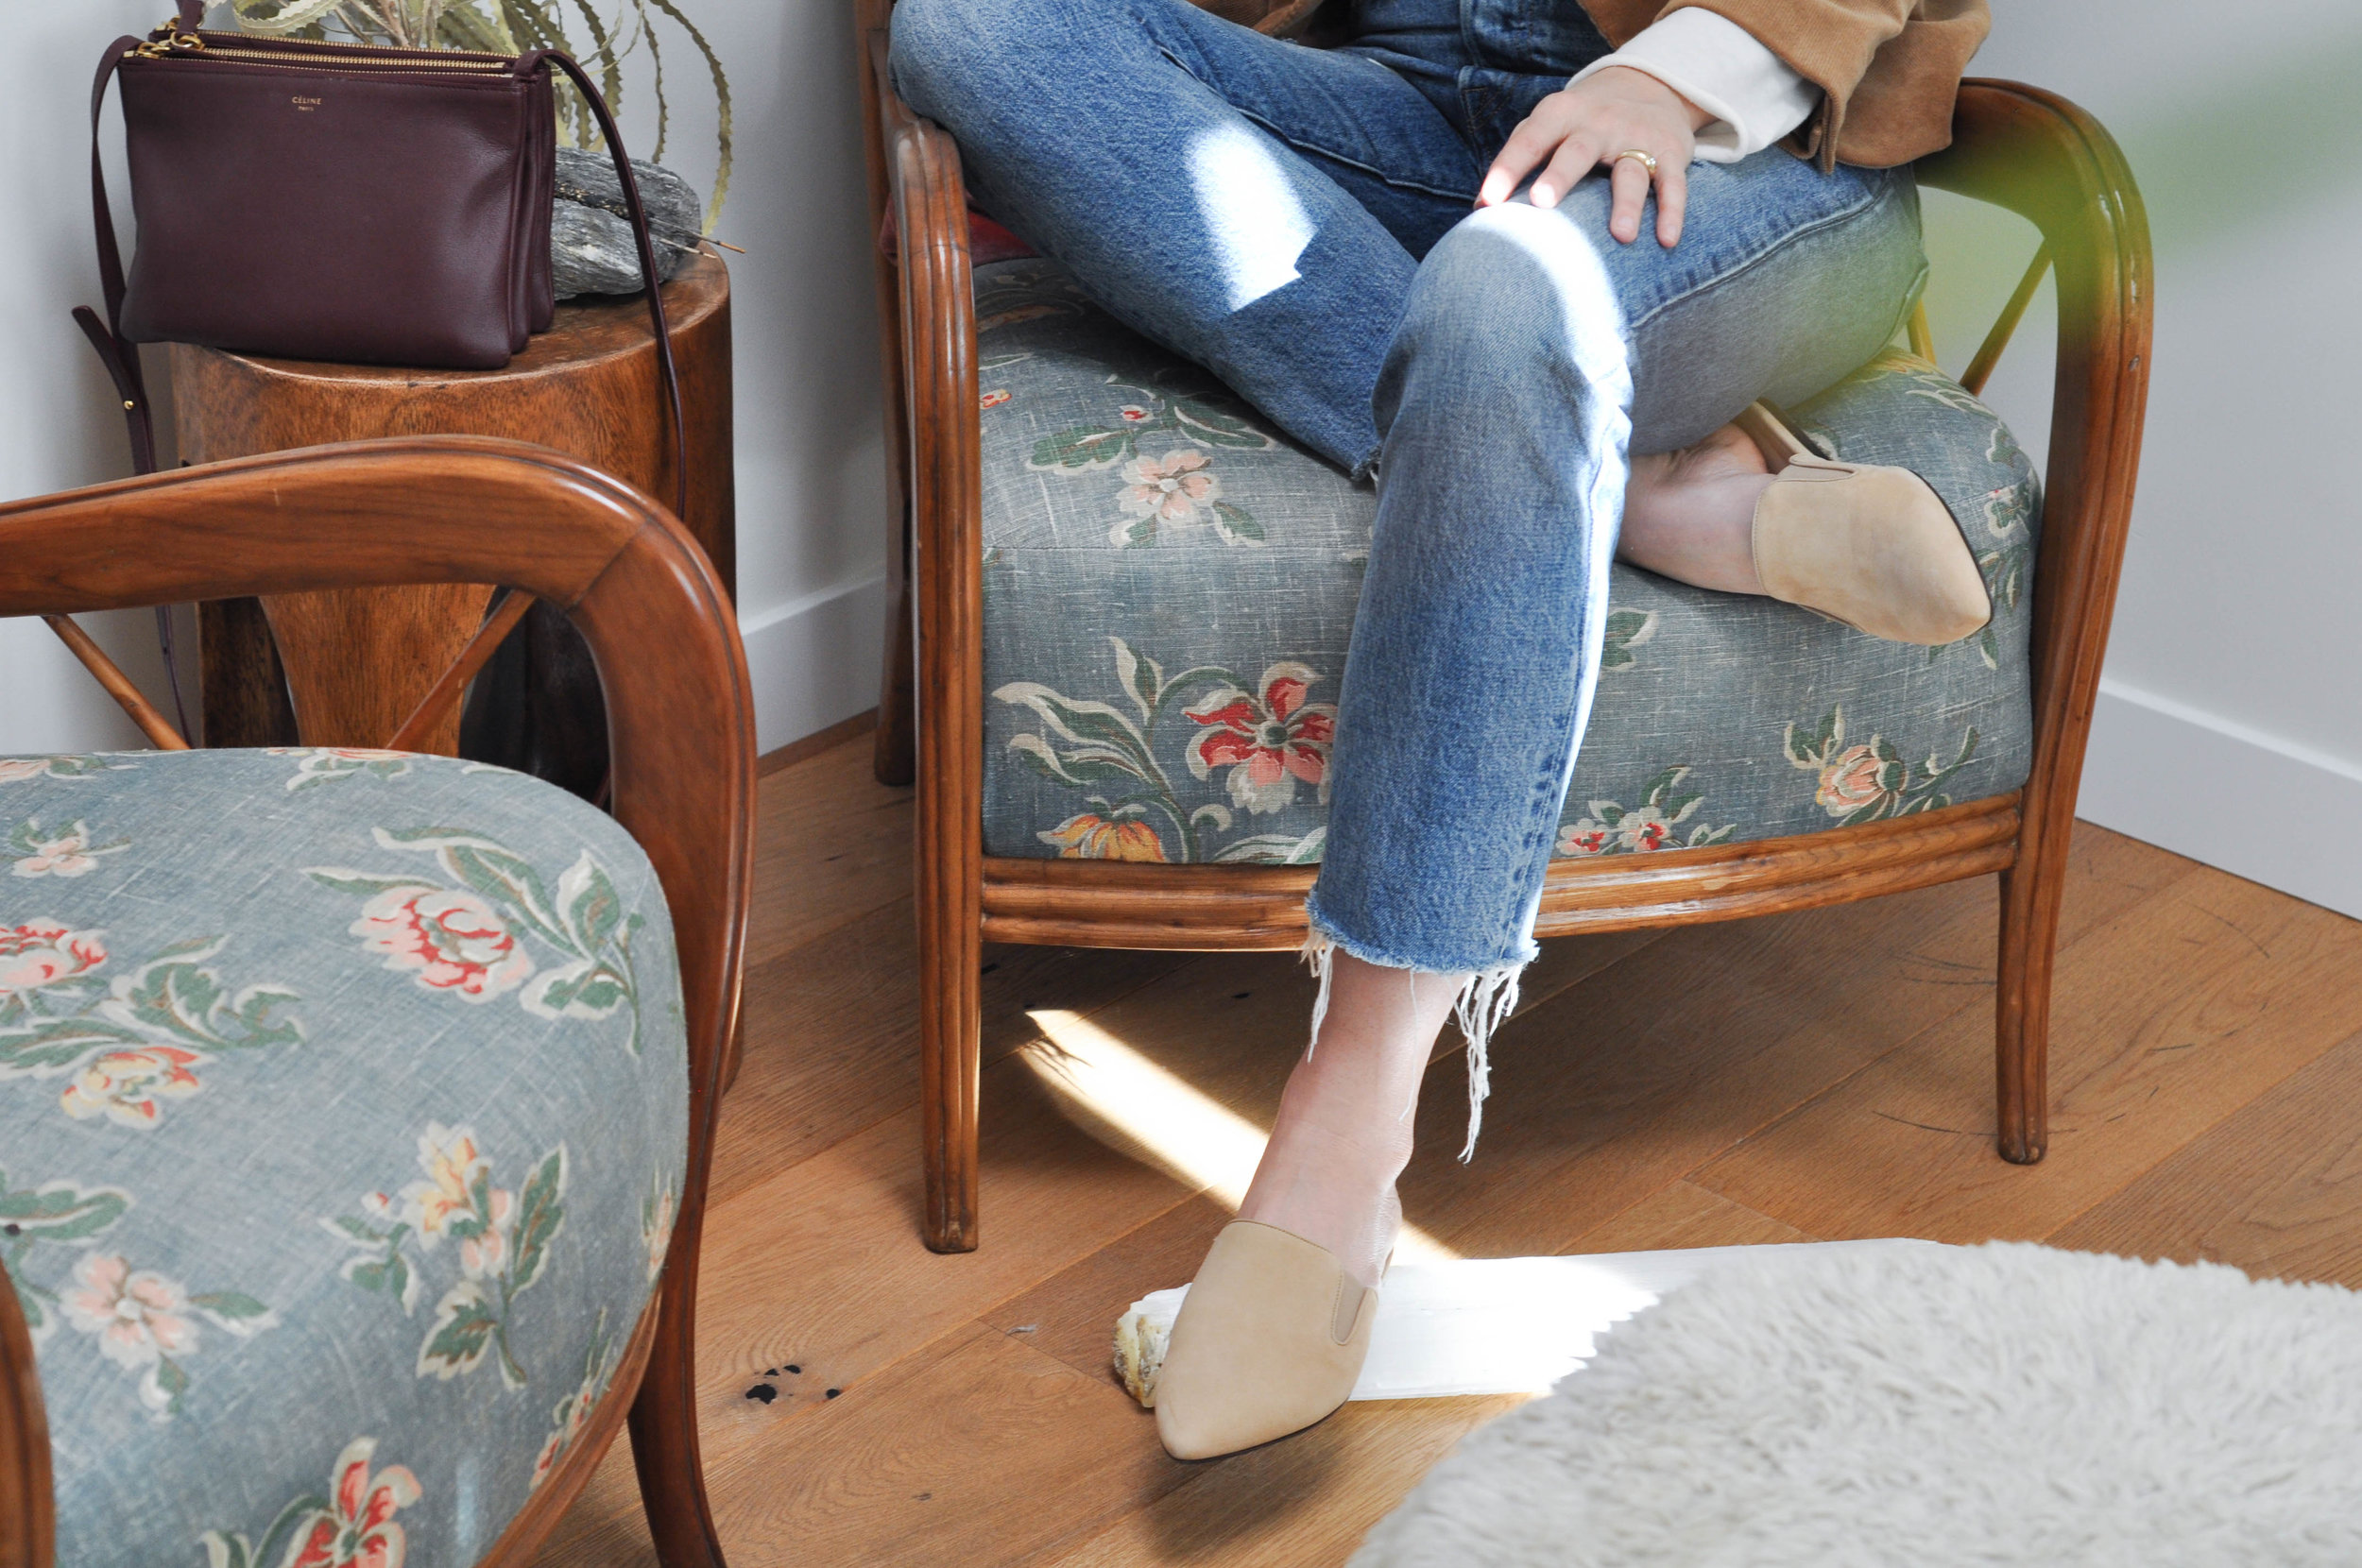 blazer_mules_jeans_purse_chair_side_table_ring_white_shirt_sheepskin_2 (1 of 1).jpg